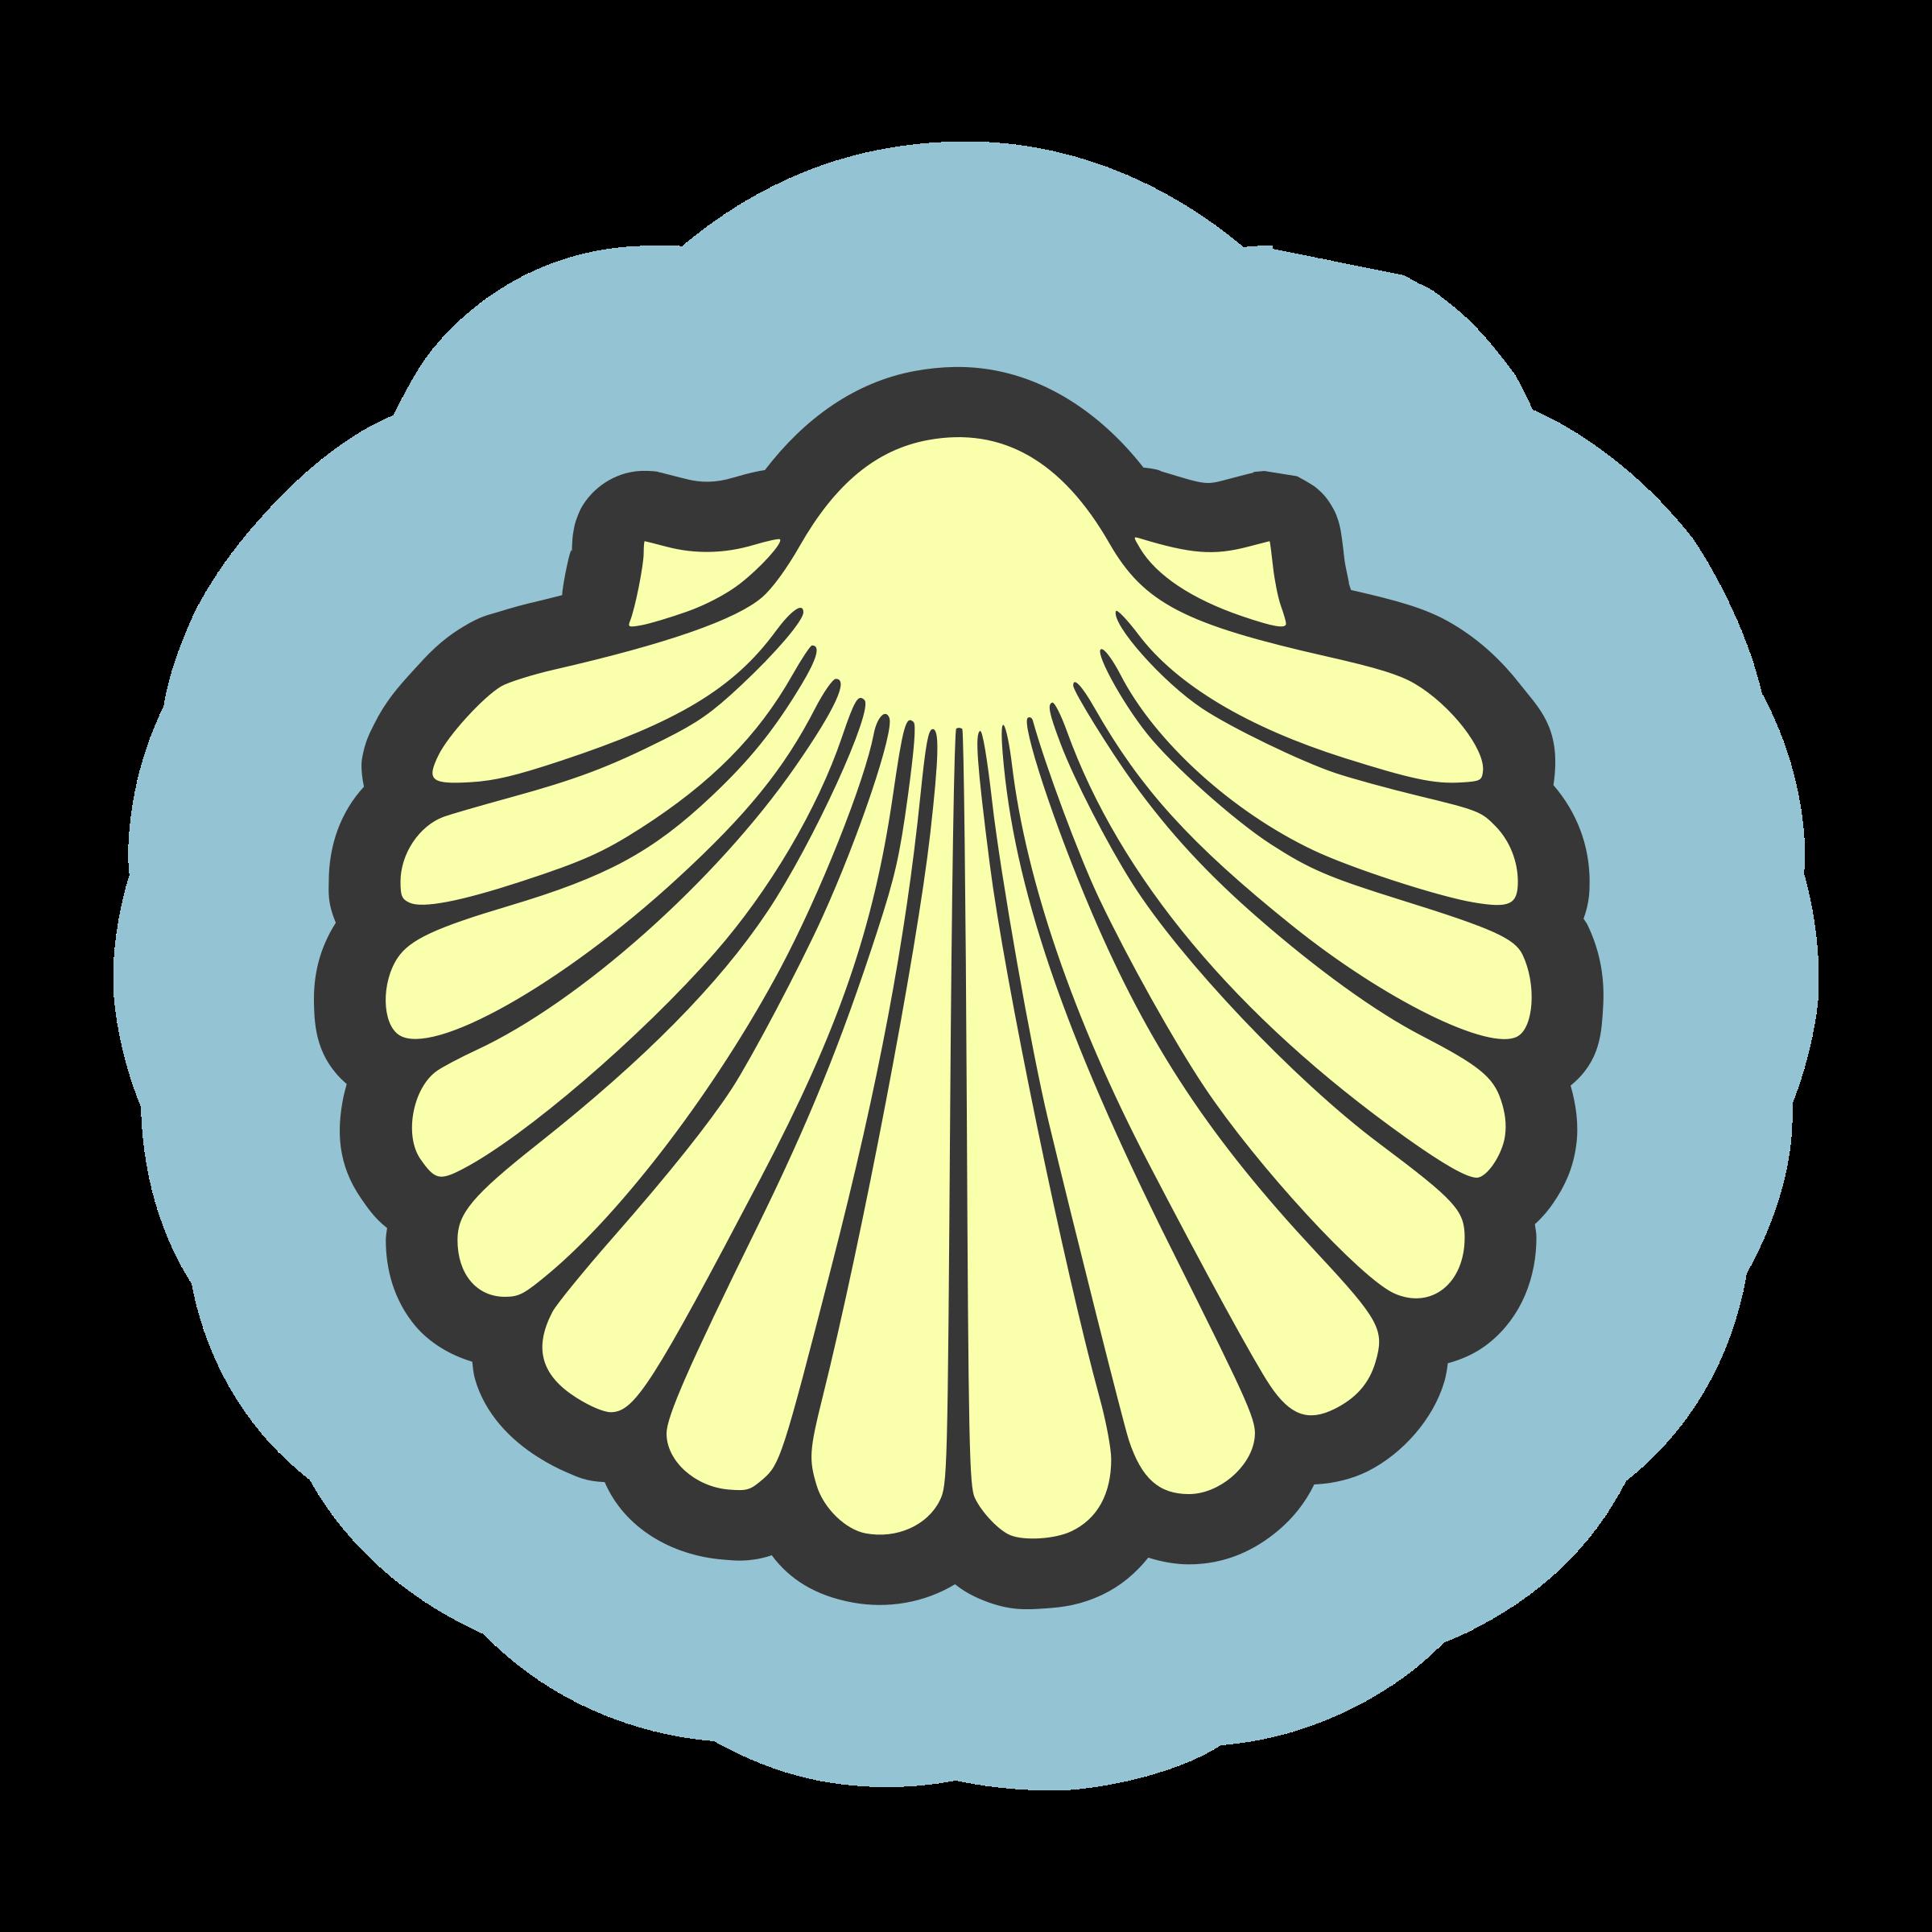 Shell clipart sea rock. Seashell scallop frames illustrations